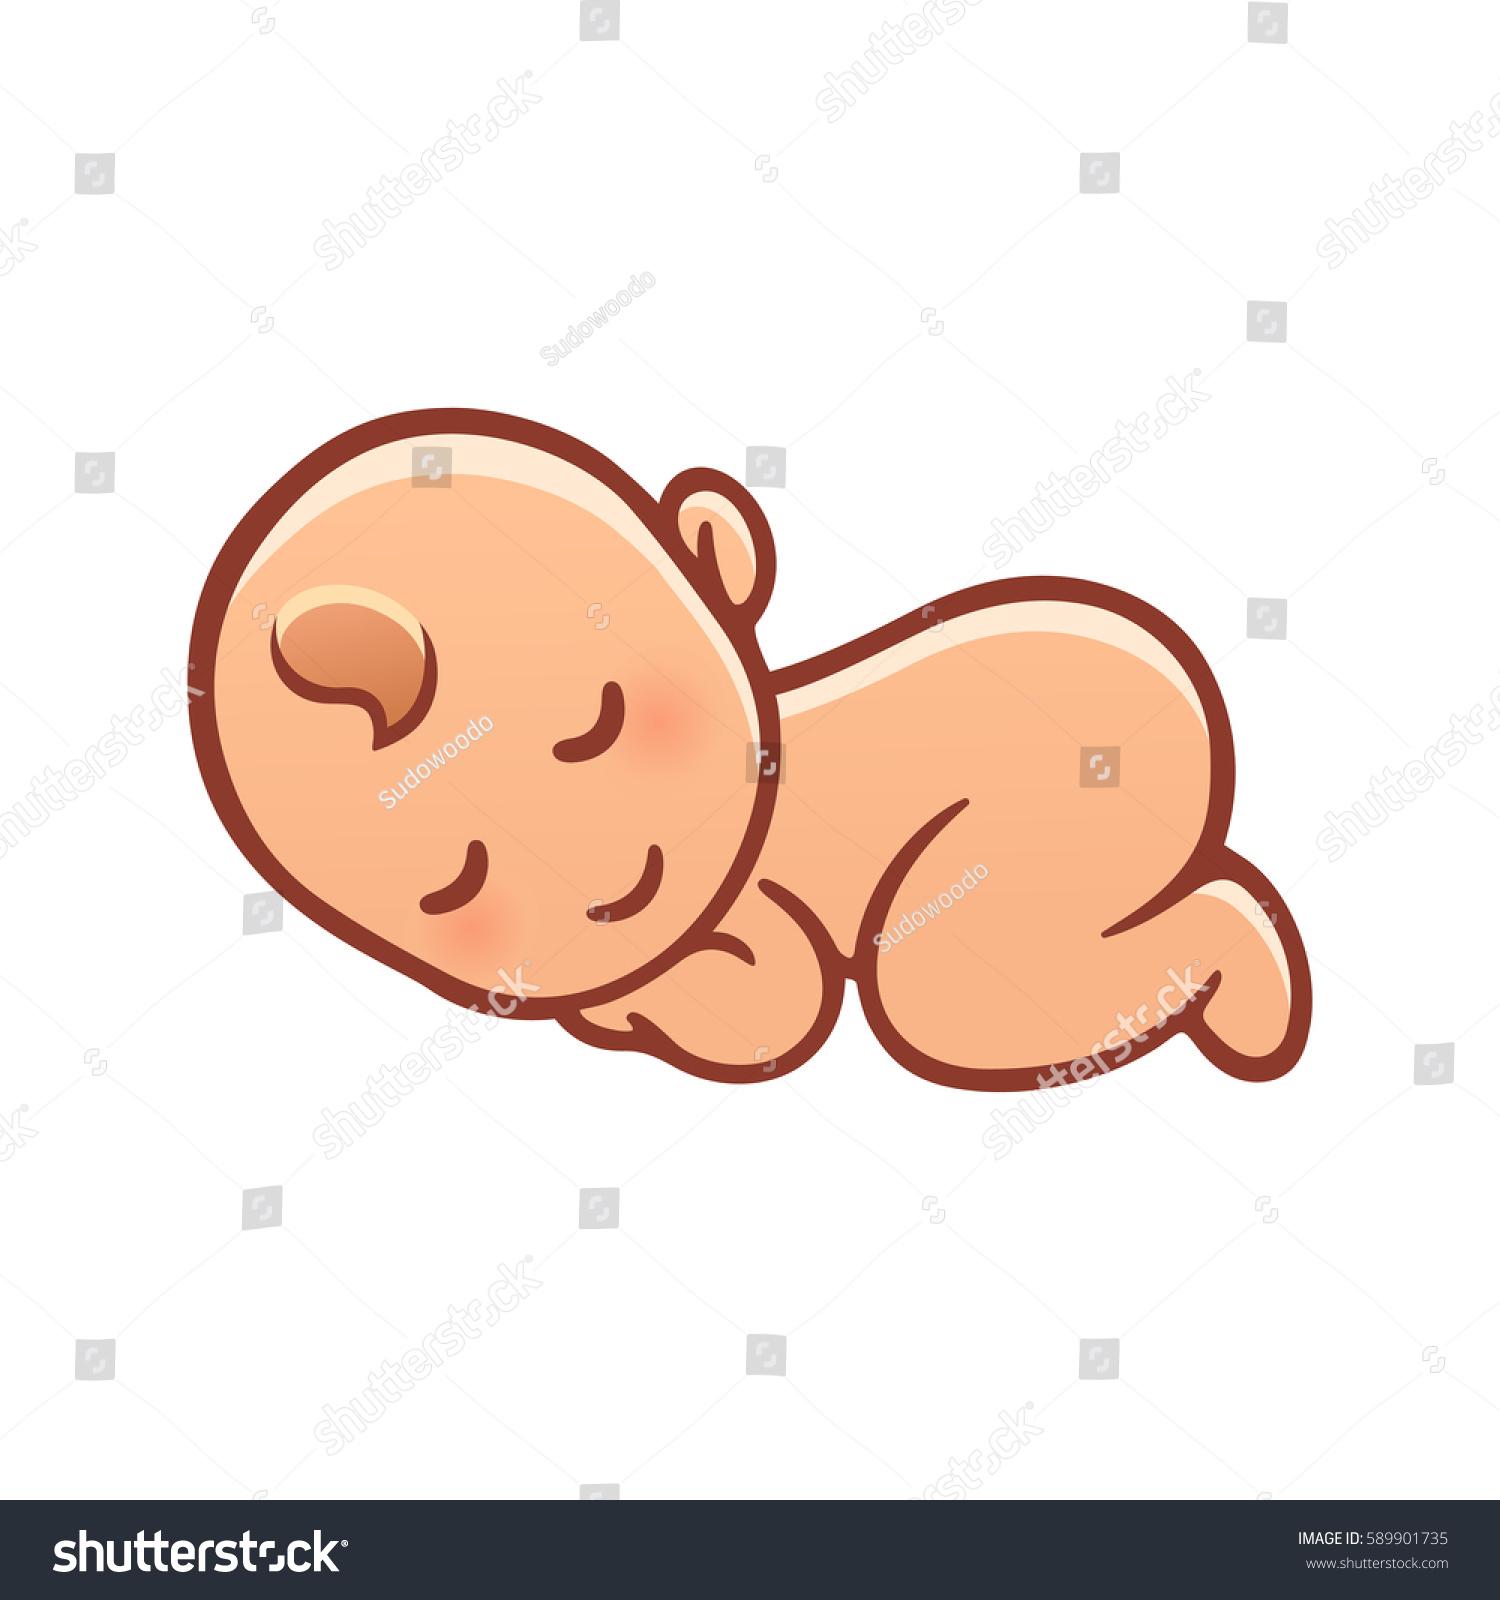 1500x1600 Baby Cartoon Drawing Cute Sleeping Baby Drawing Simple Cartoon